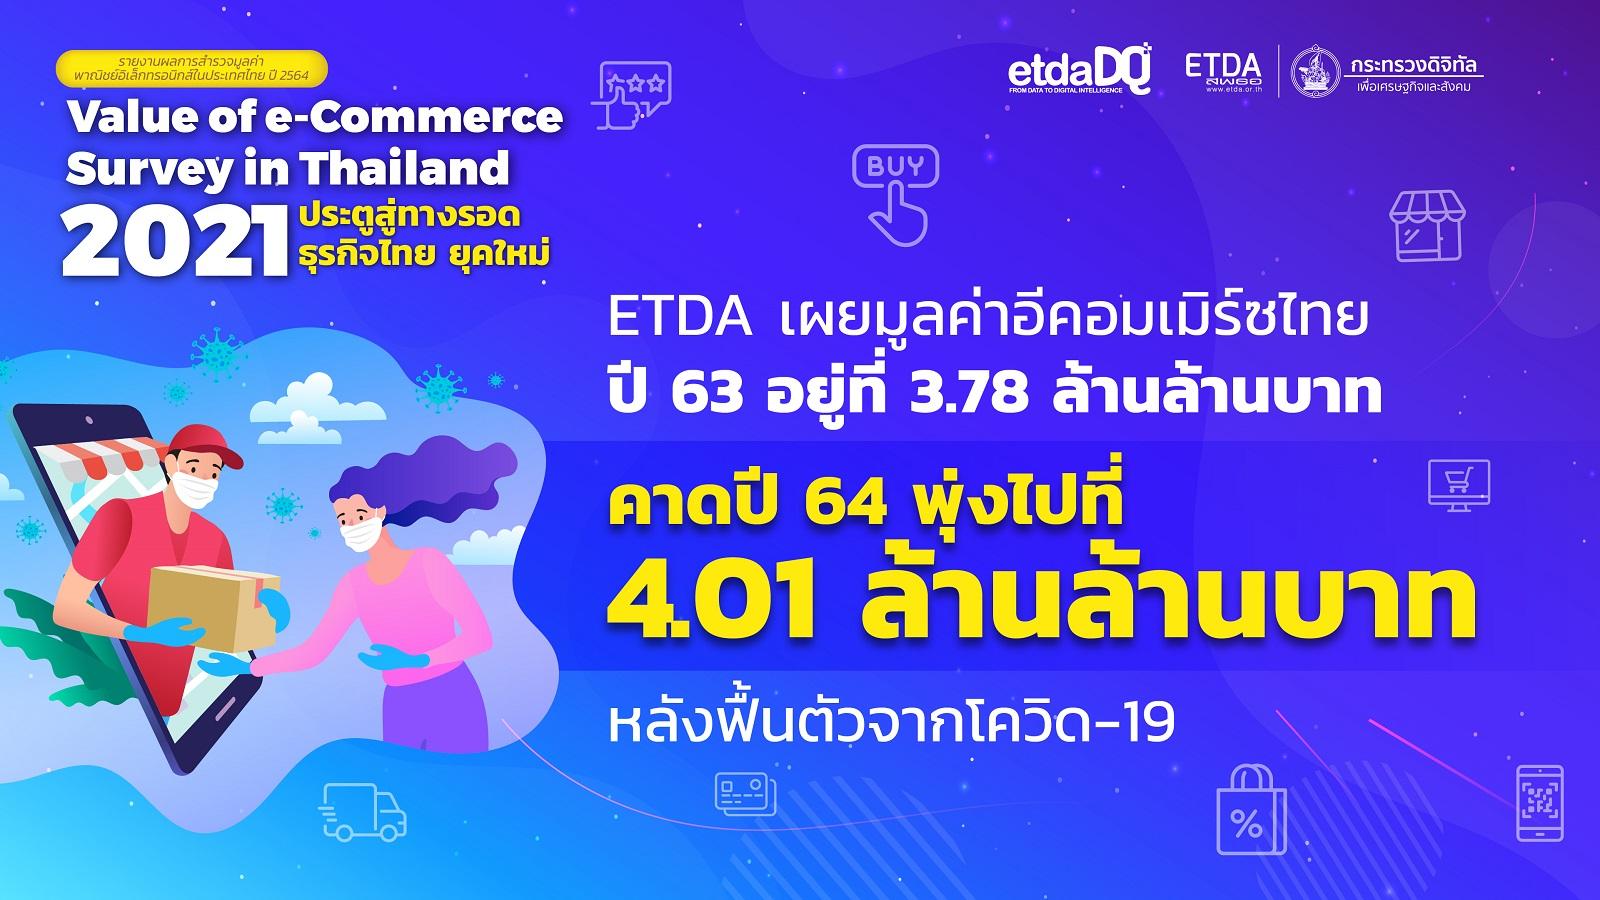 ETDA เผยมูลค่าอีคอมเมิร์ซไทยปี 63 อยู่ที่ 3.78 ล้านล้านบาทคาดปี 64 พุ่งไปที่ 4.01 ล้านล้านบาท